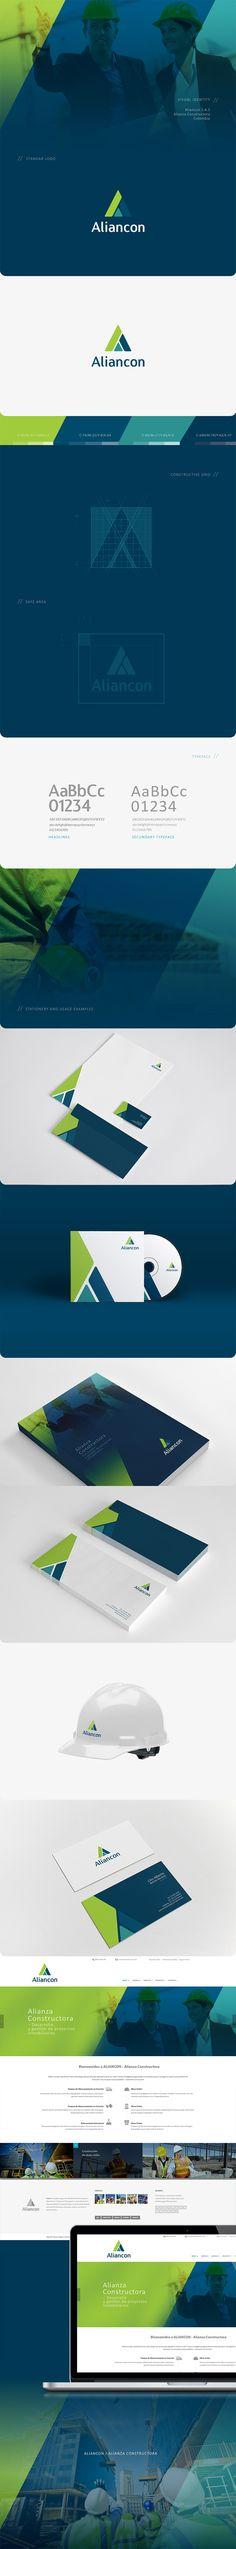 #aliancon #design #identity #logo #branding #stationery #oven #claudiarueda #diegocaceres  Branding project - Aliancon by Oven